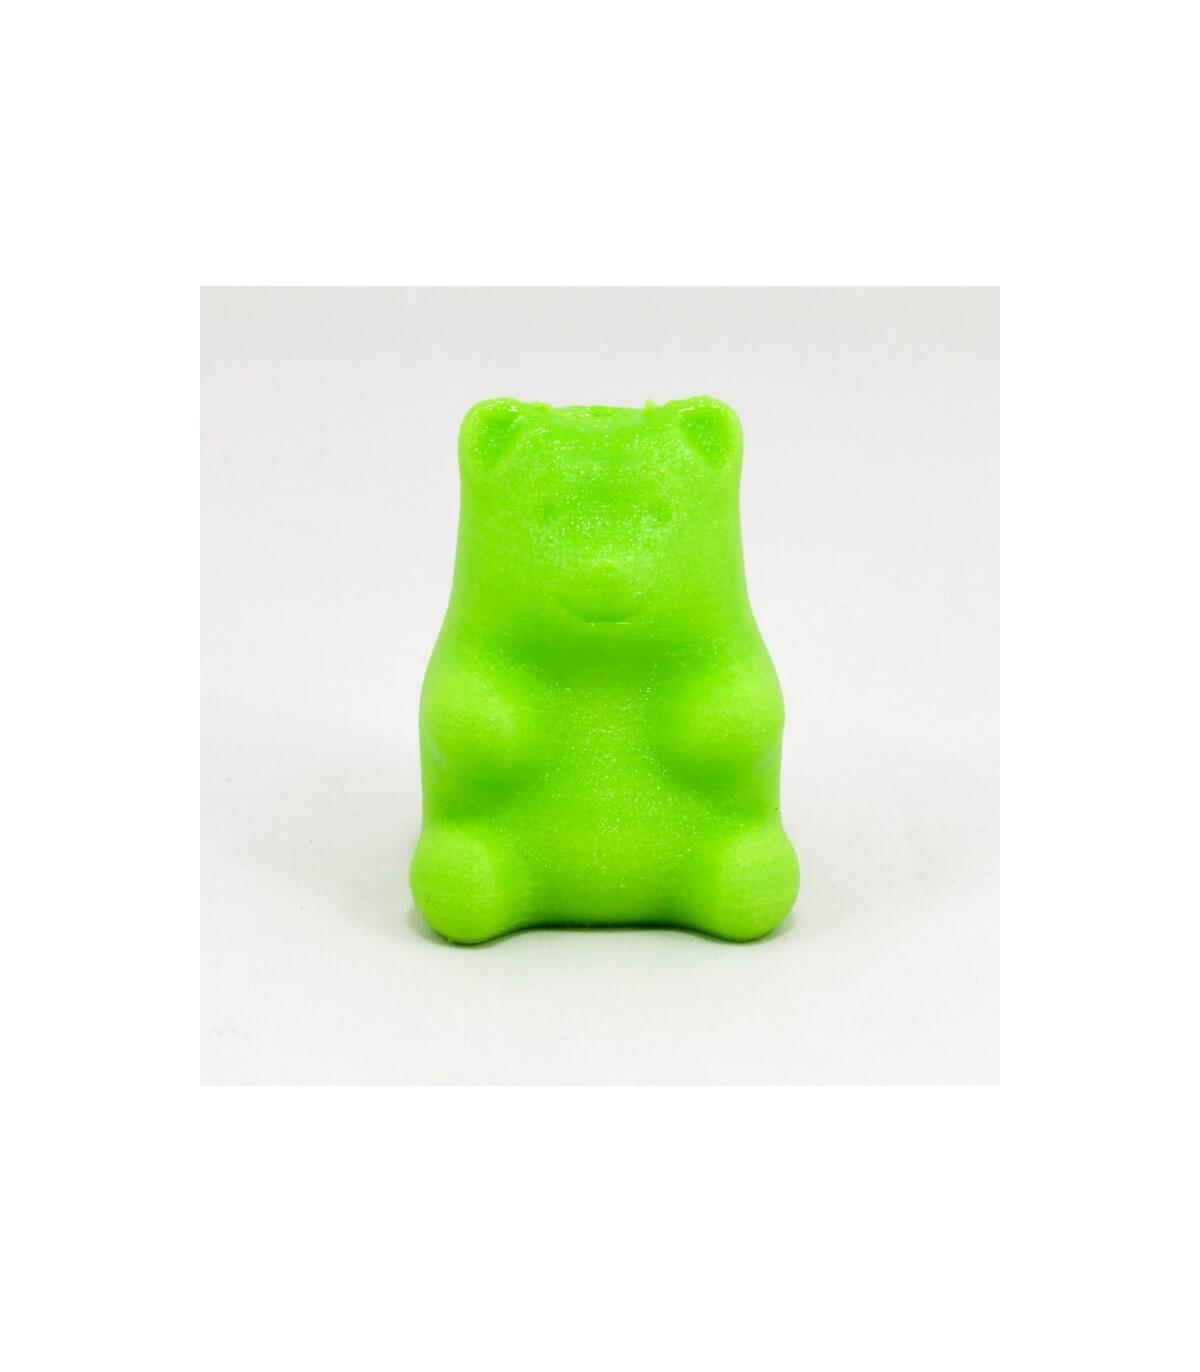 Filaflex Verde 95A y Oso